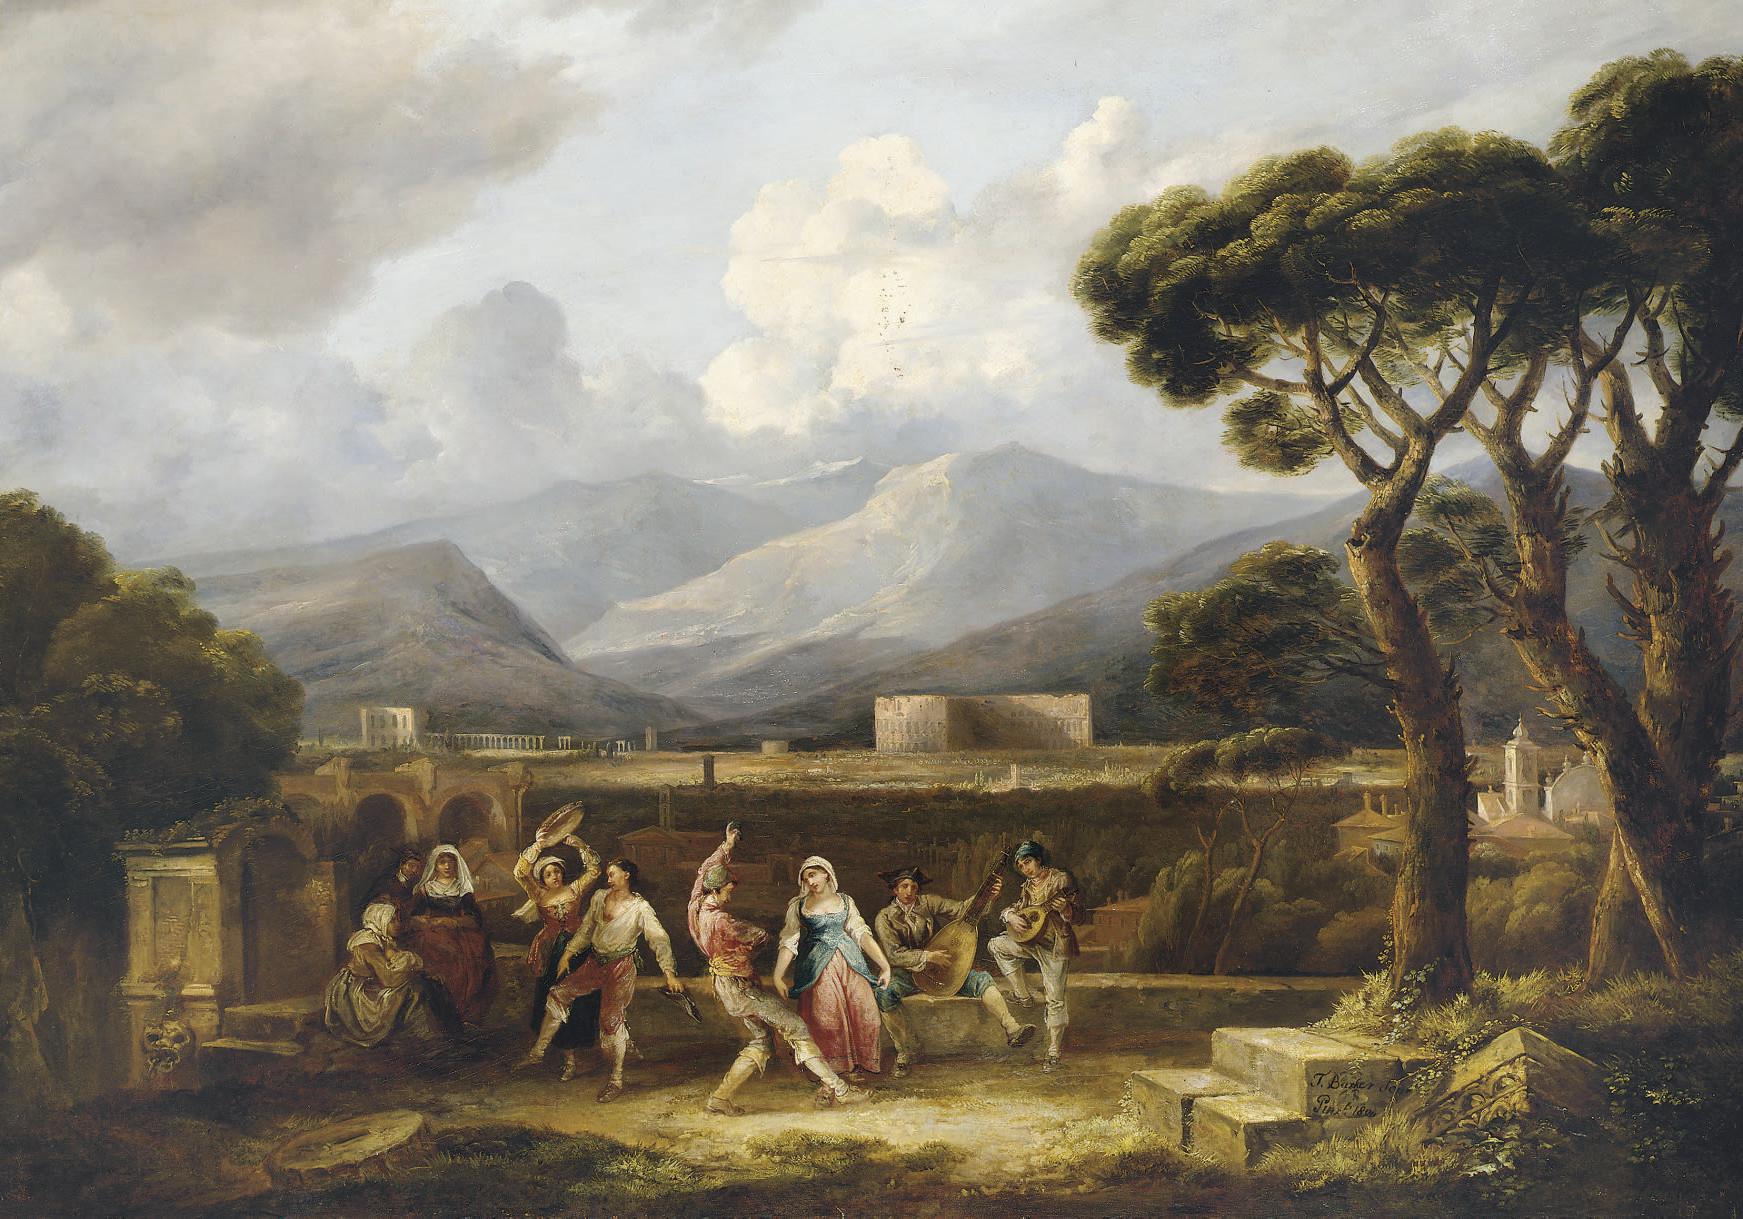 THOMAS BARKER (1769-1847)